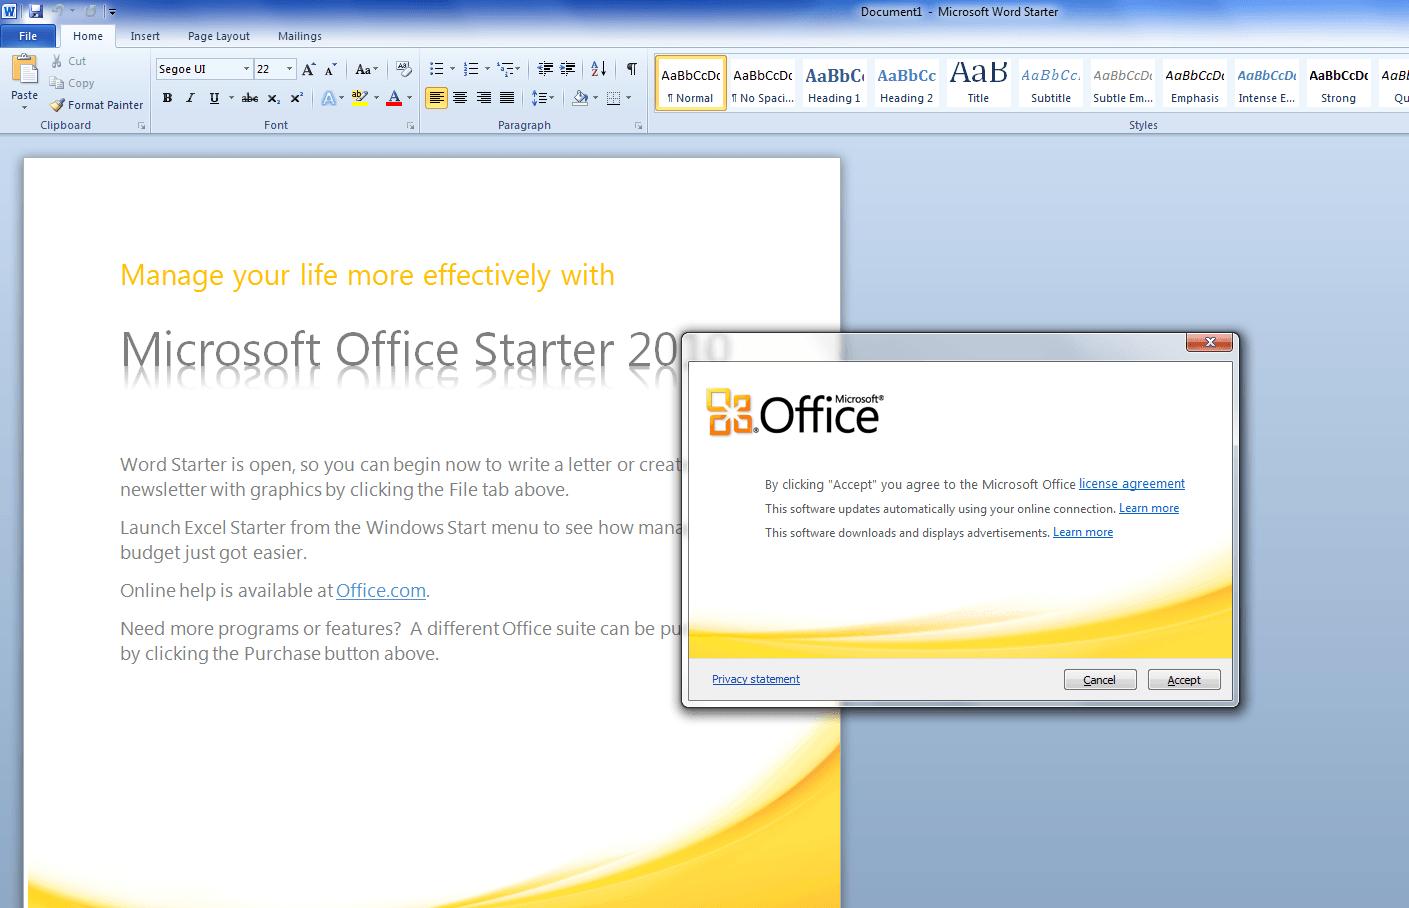 Microsoft Office Starter 2010 - Κατέβασε τα νόμιμα και δωρεάν